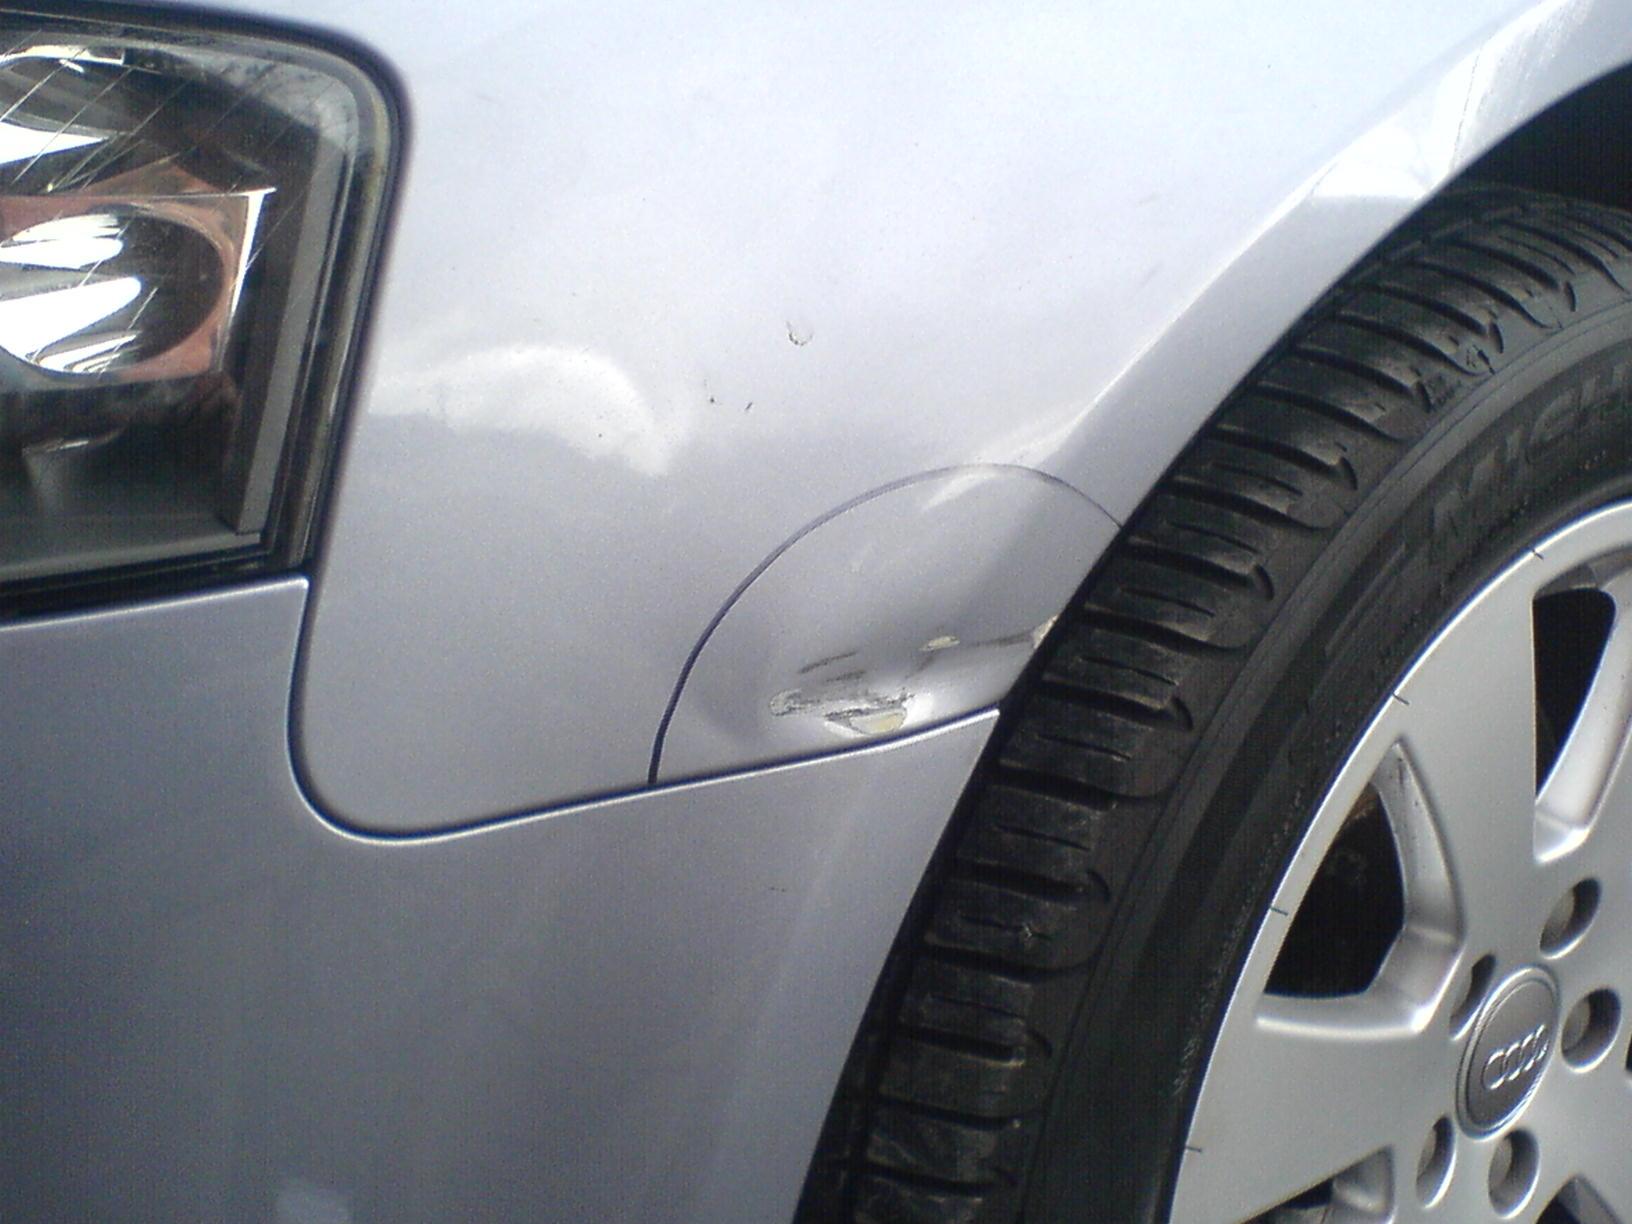 Car wing dent identified for insurance repair